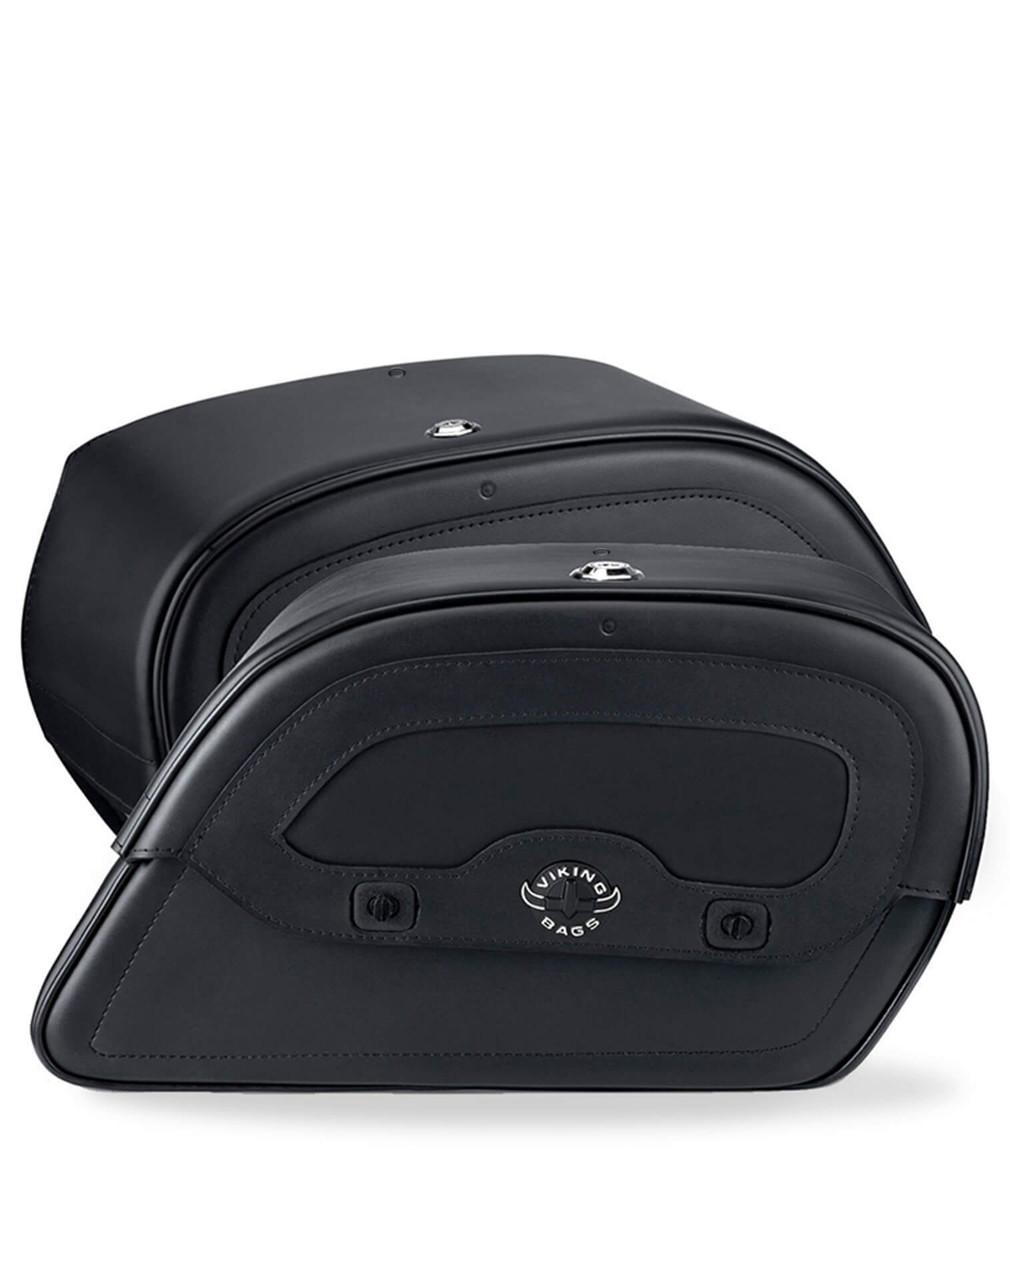 Honda VTX 1300 C Medium Warrior Motorcycle Saddlebags Both Bags view